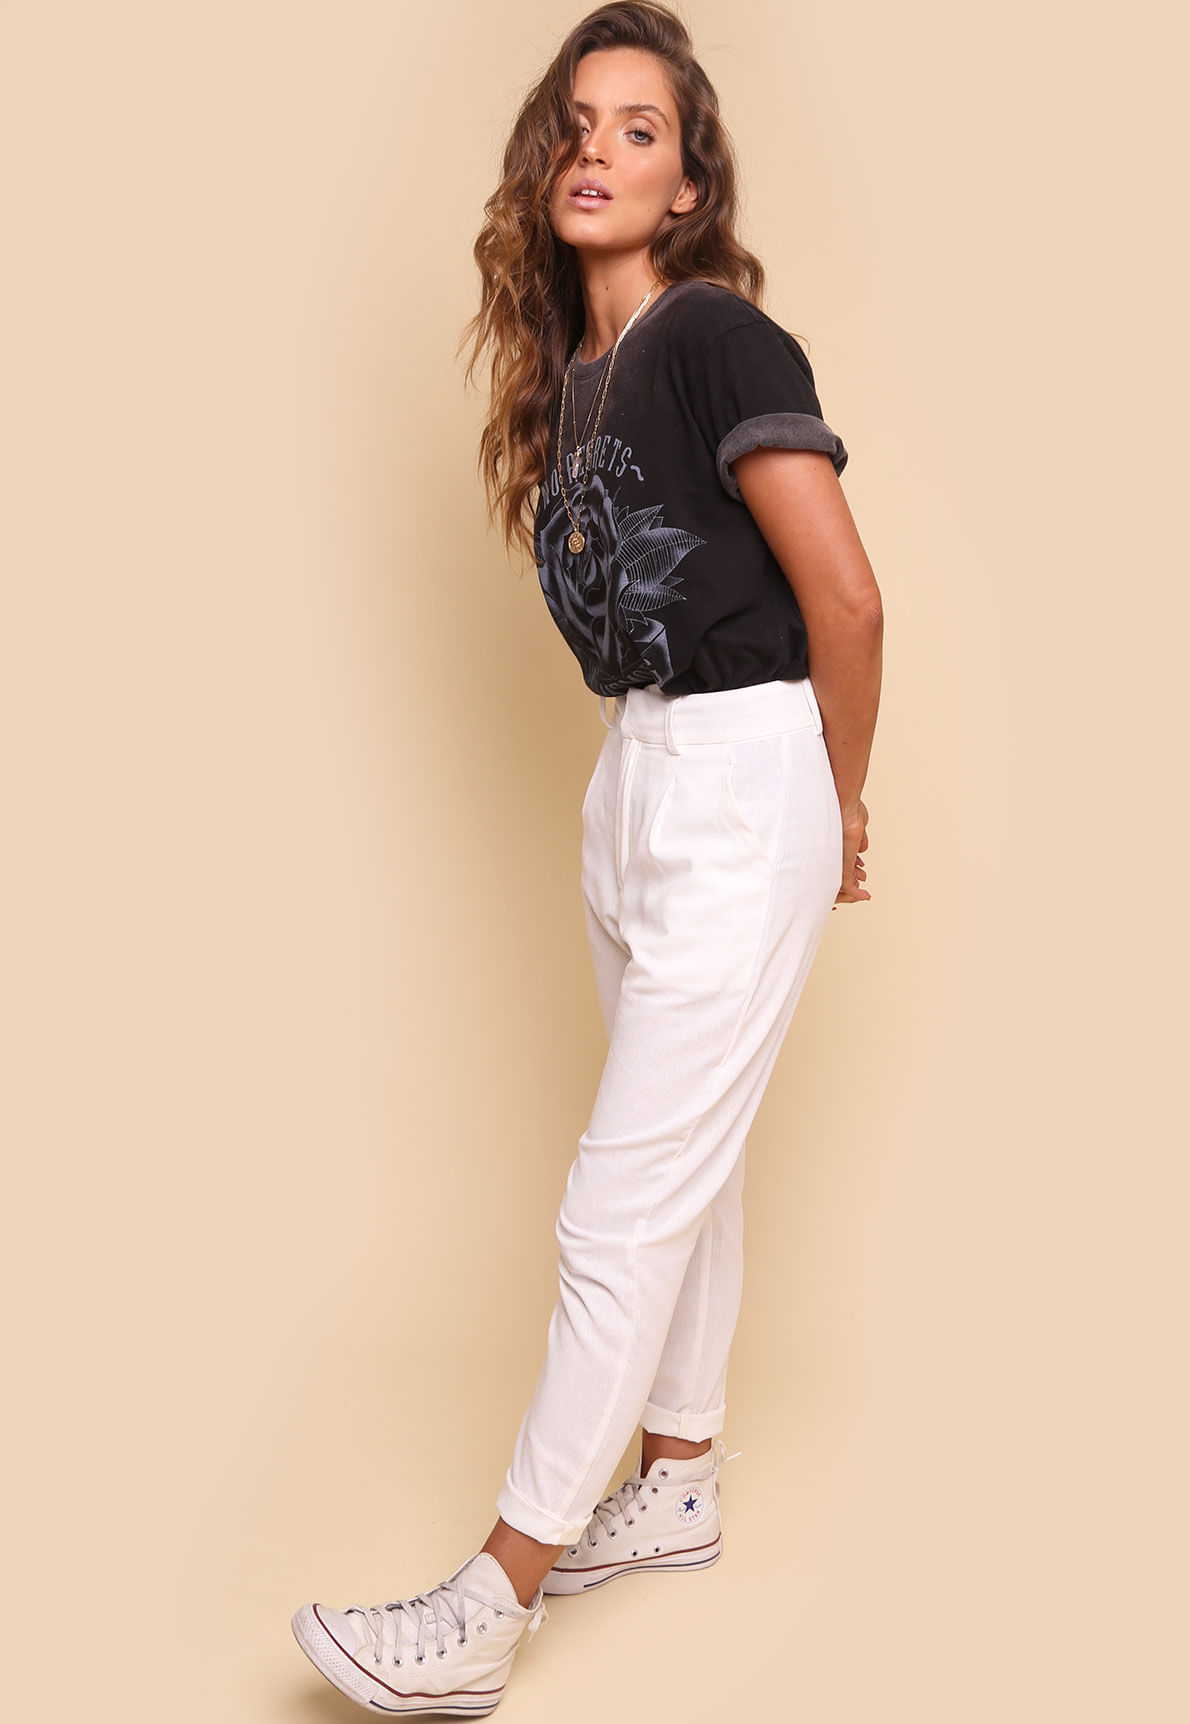 30688-calca-alfaiataria-off-white-laila-mundo-lolita-07